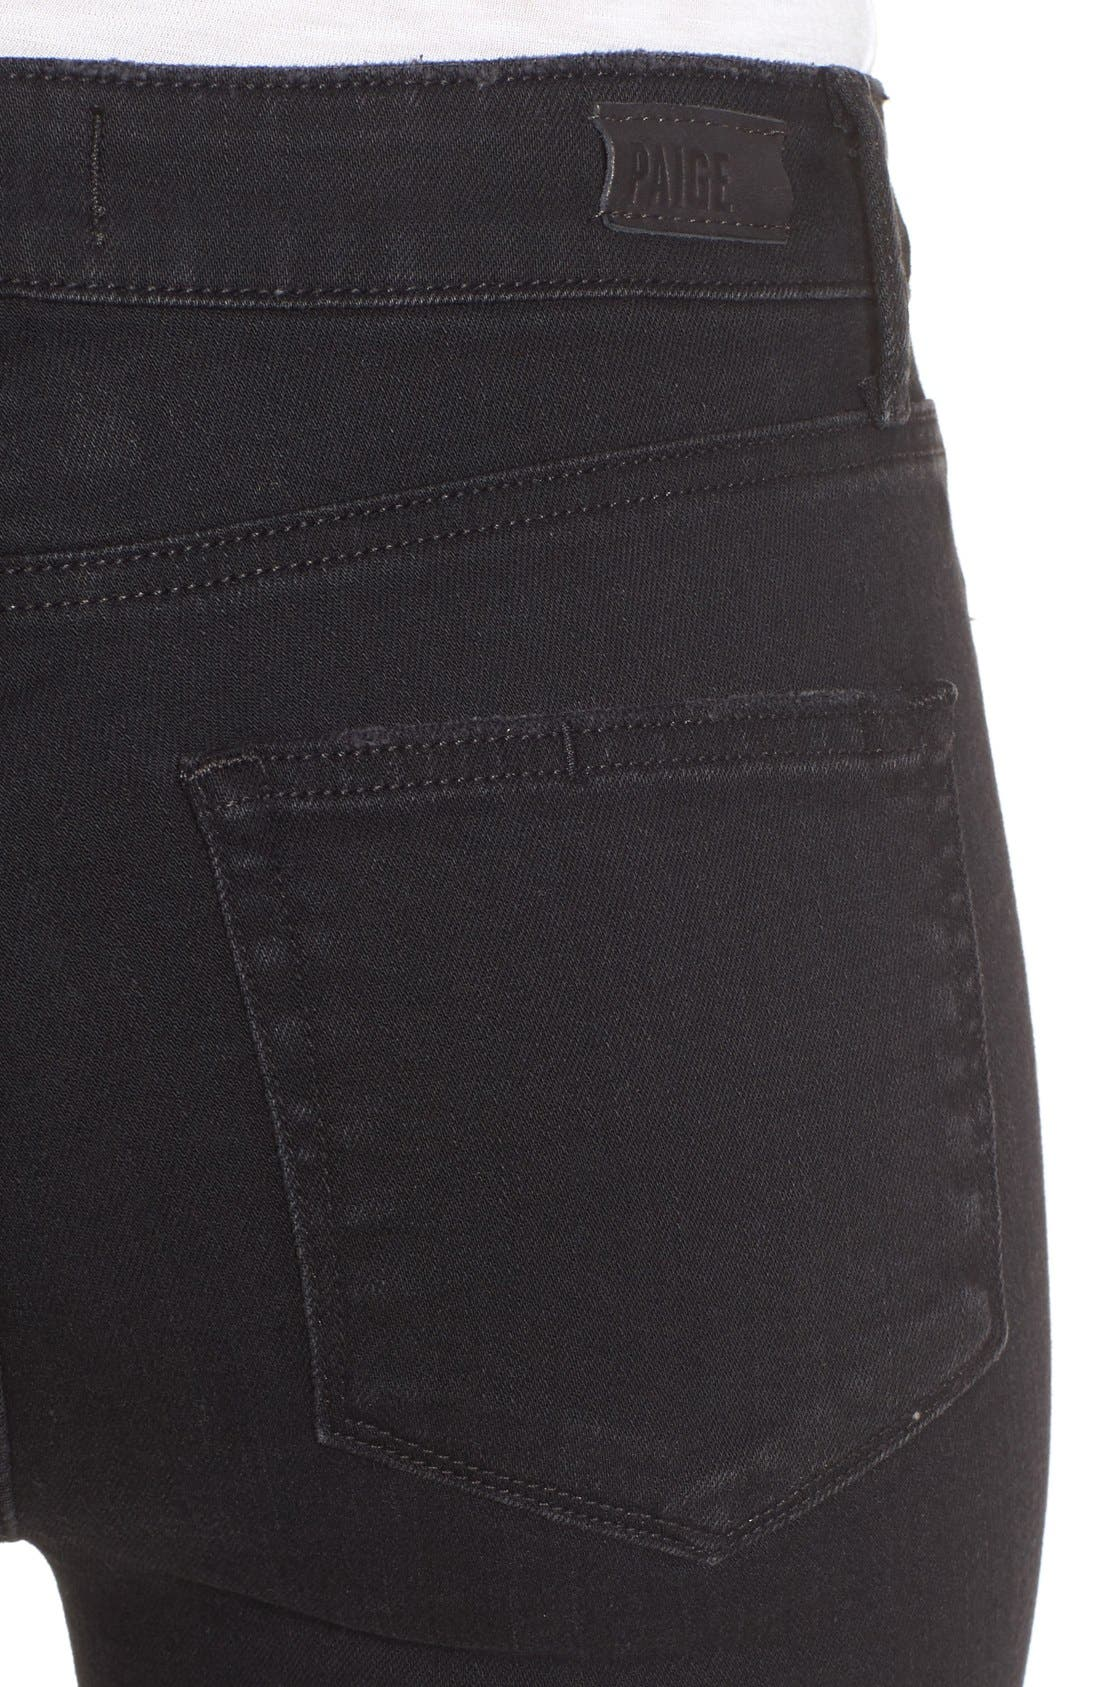 Colette High Waist Raw Hem Crop Flare Jeans,                             Alternate thumbnail 4, color,                             001